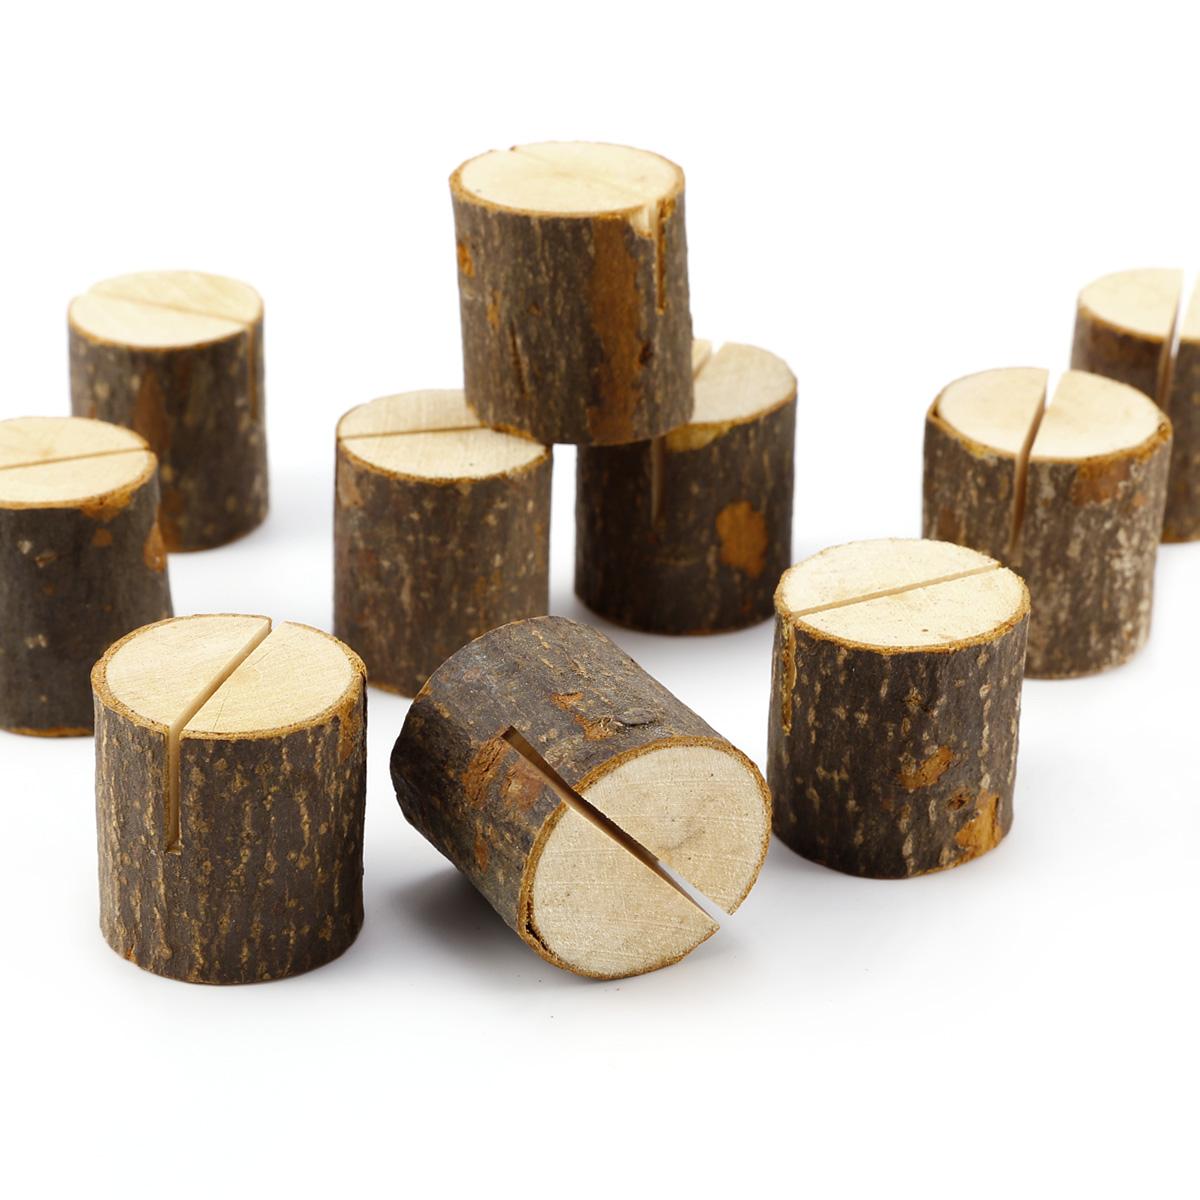 100 x Holz Holzteg Tischkartenhalter Platzkartenhalter Notizhalter ...